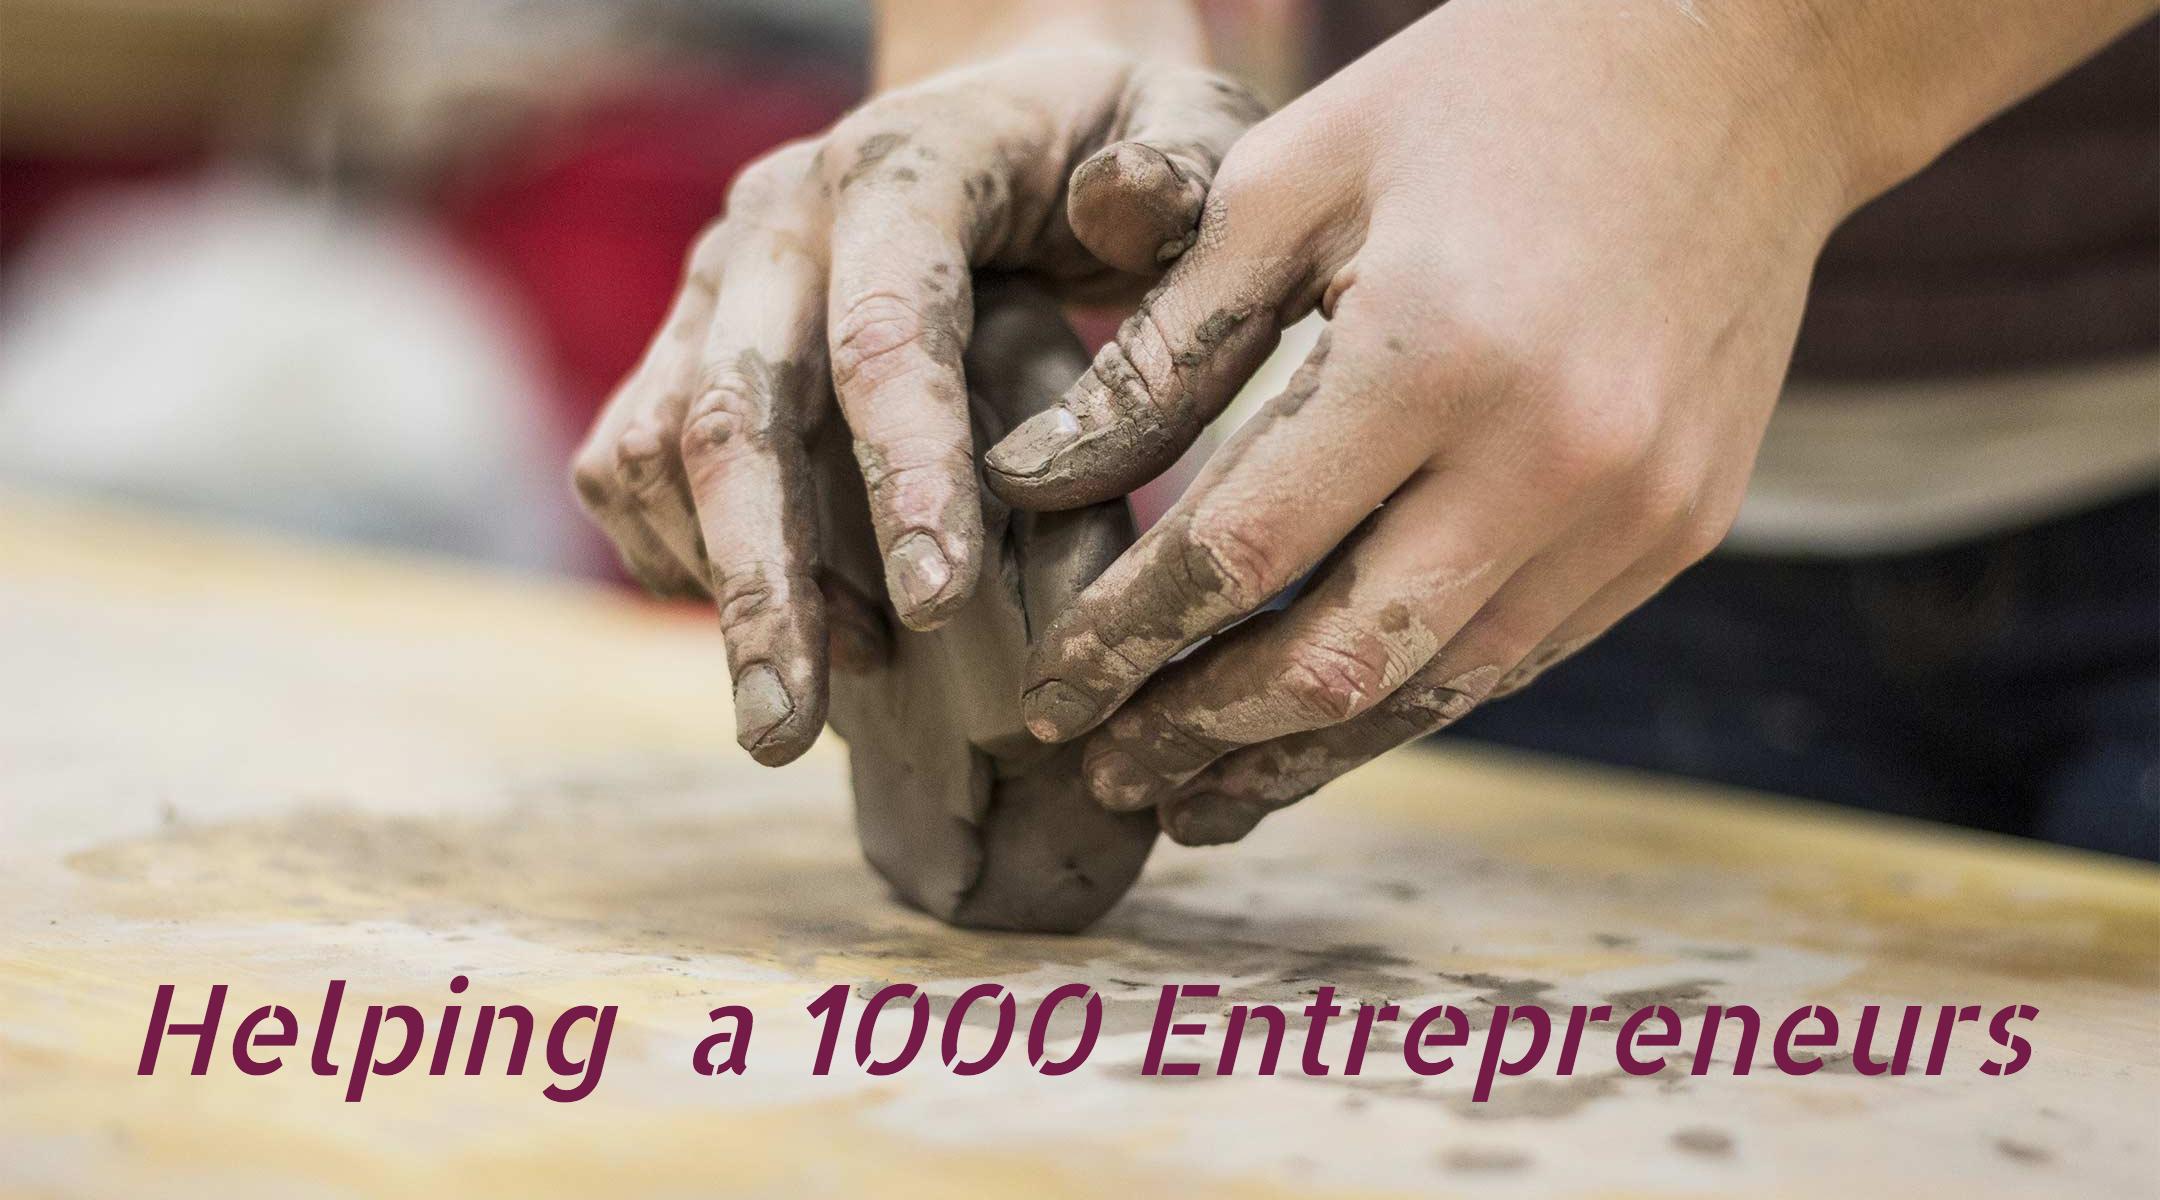 Helping a 1000 Entrepreneurs